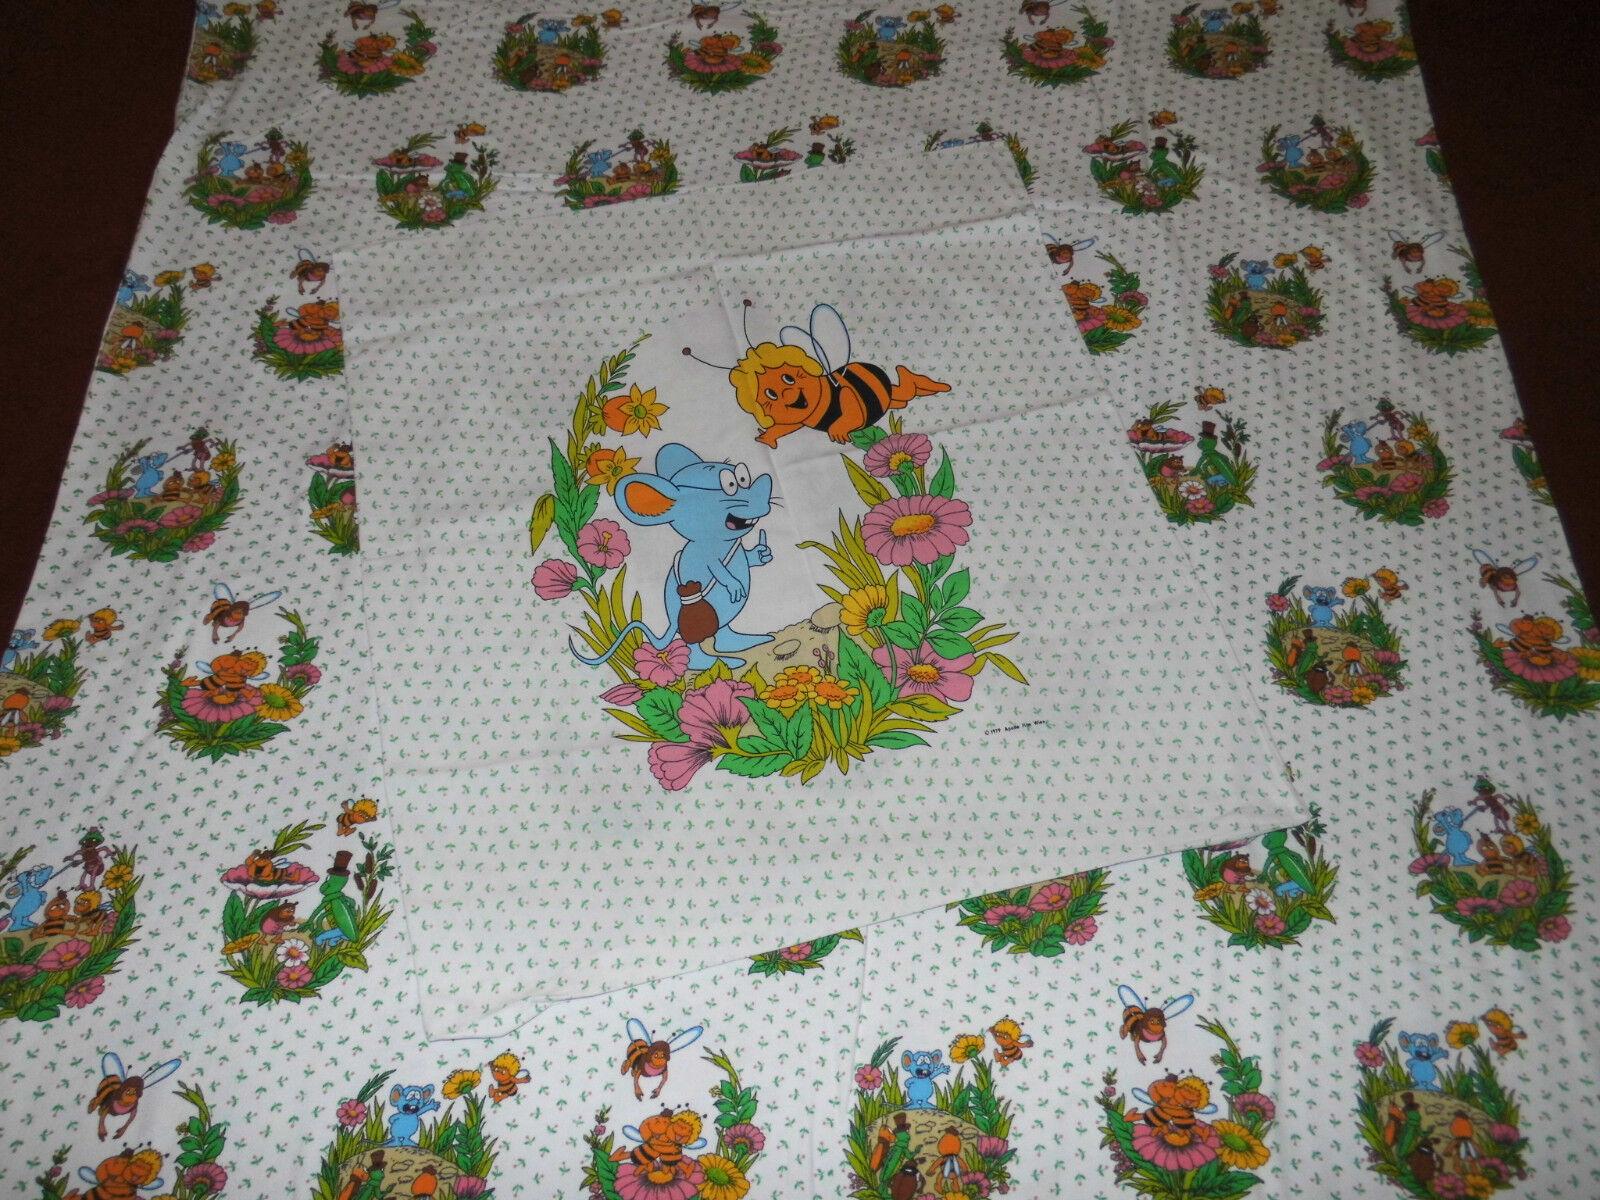 Biene Maja Bettwäsche 70er 80er vintage bedding fabric Maya the bee 70s 80s warm